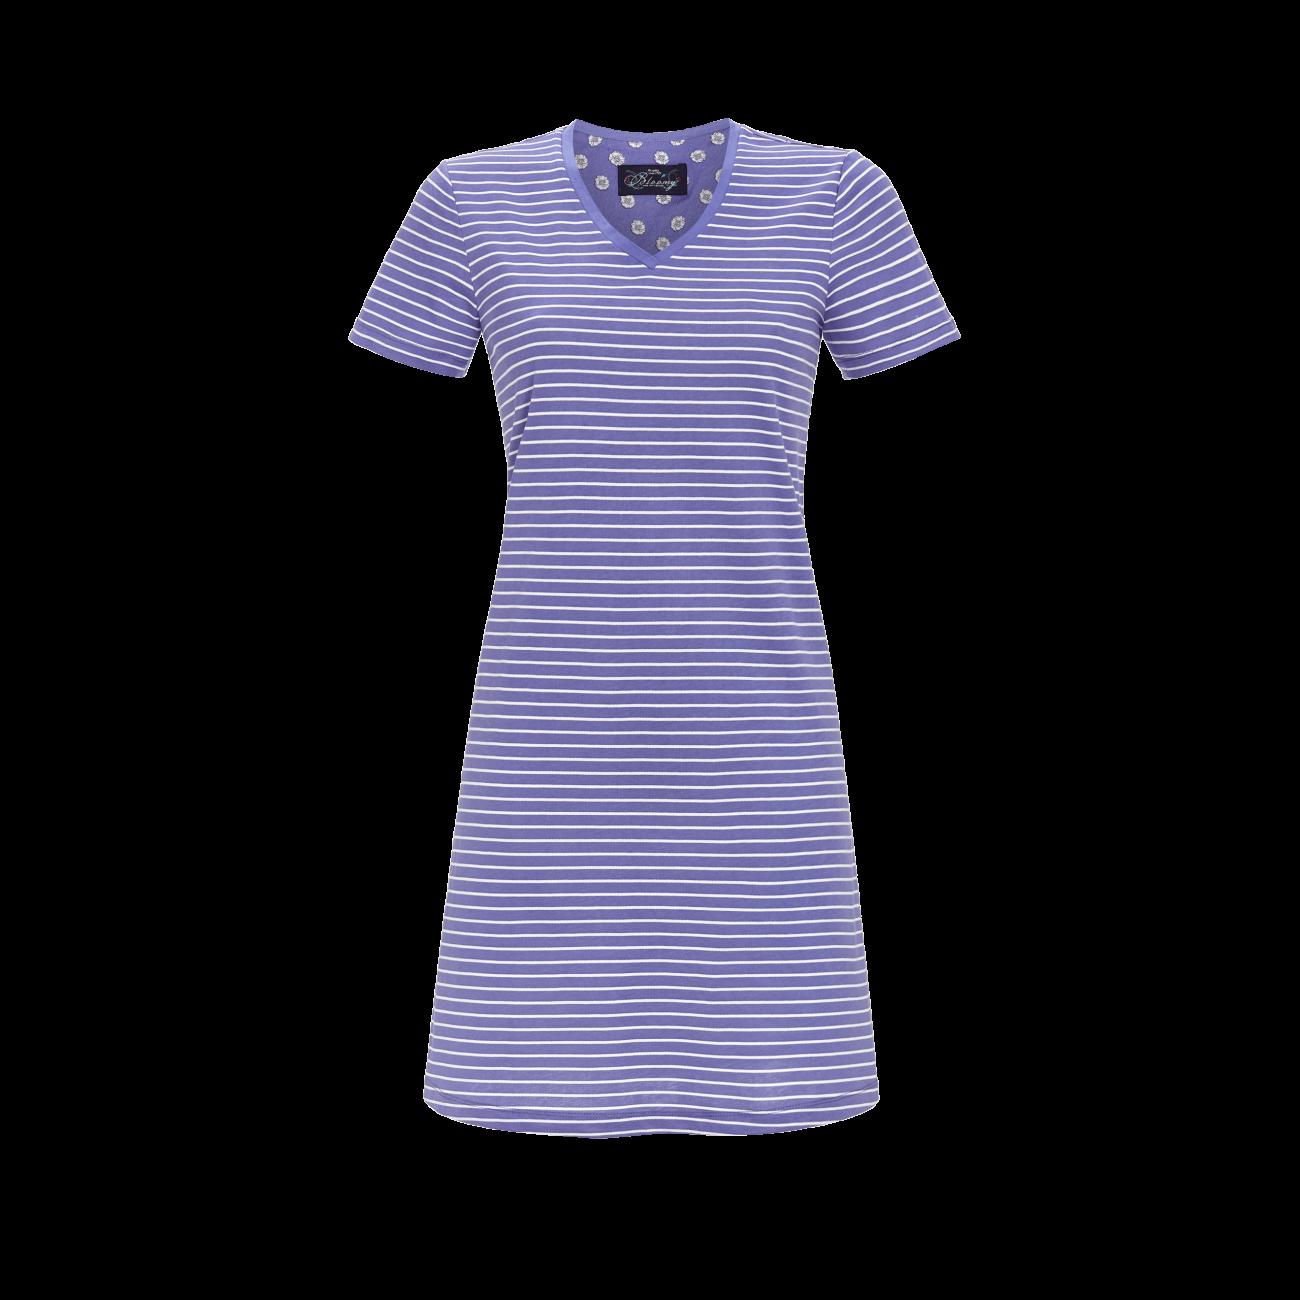 Nachthemd mit V-Ausschnitt light denim   42